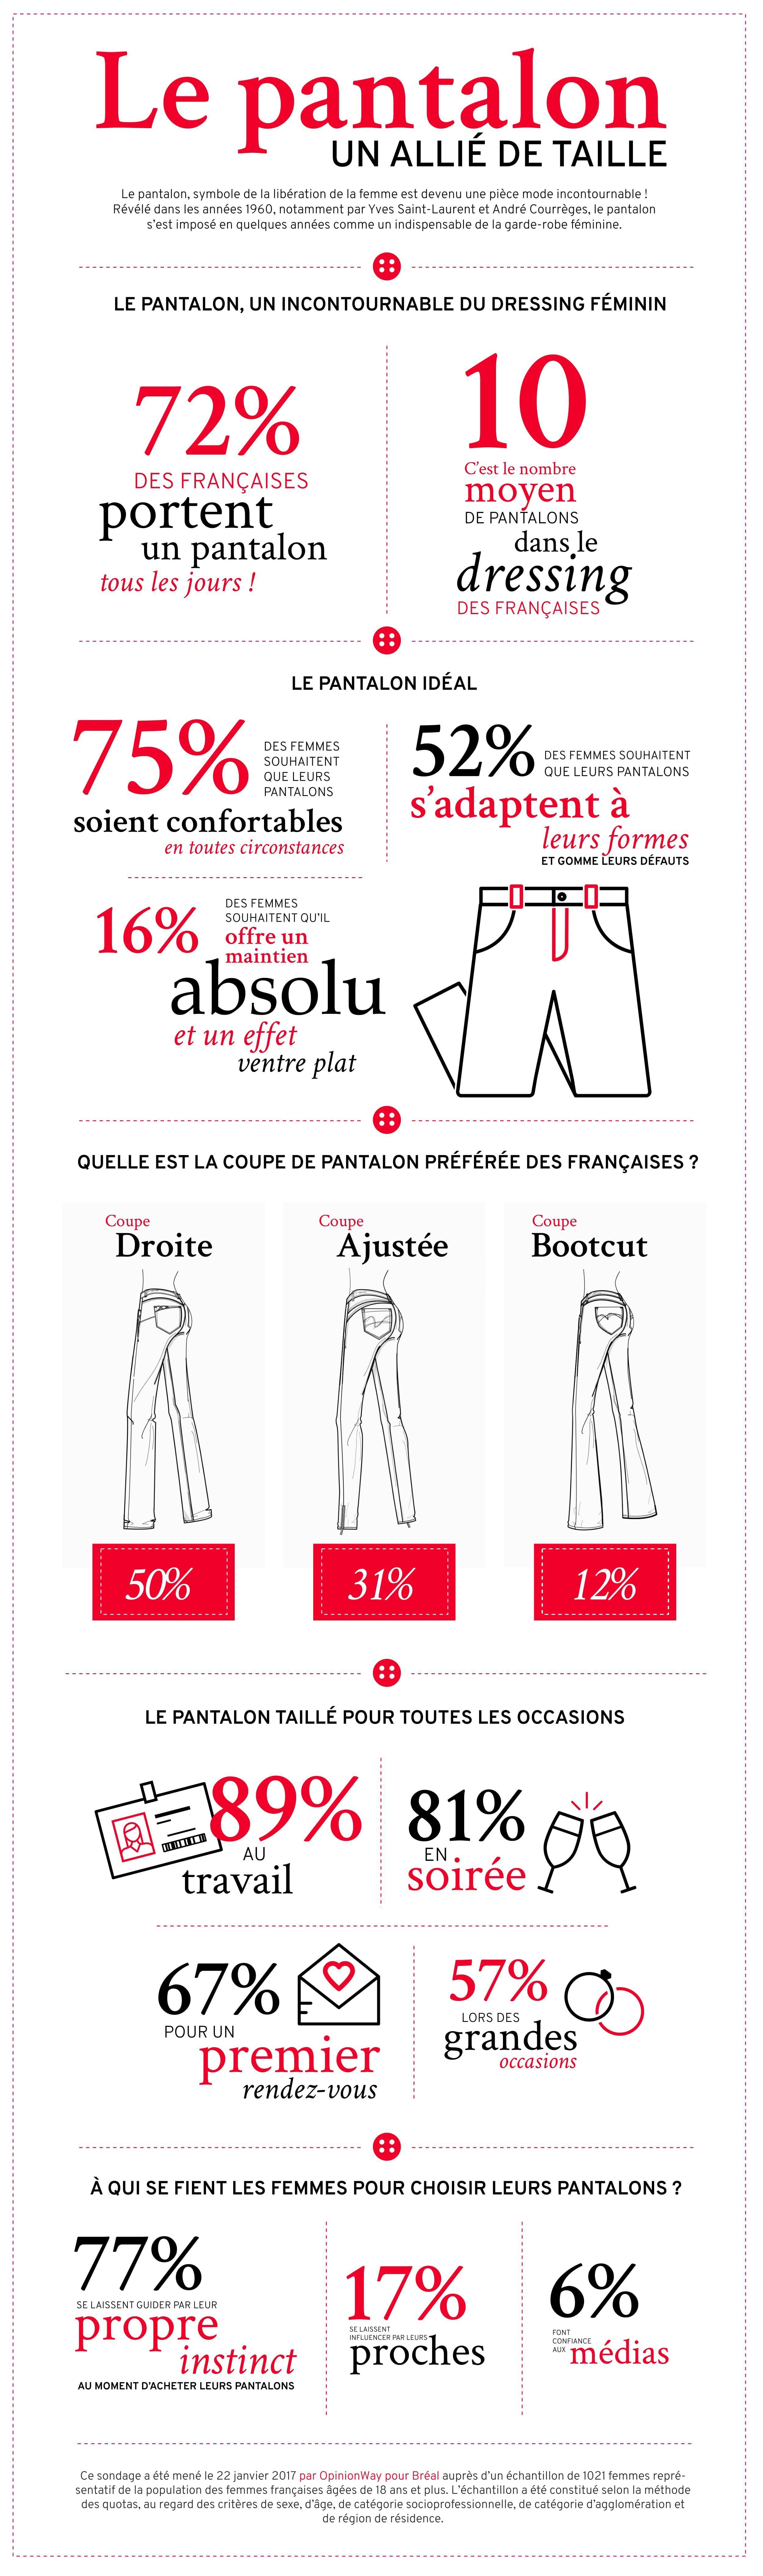 Infographie - Br+®al-1